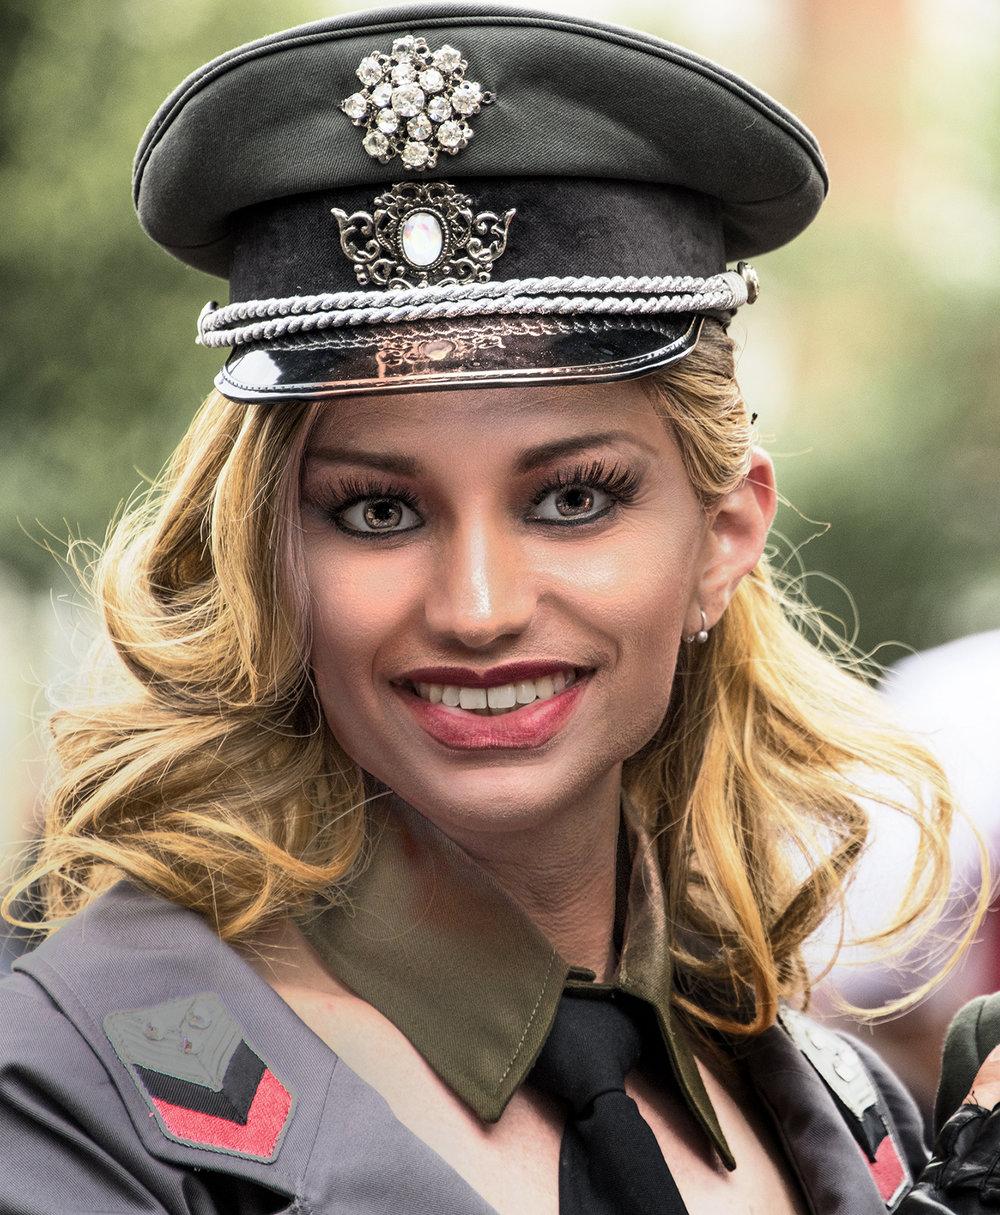 27_MICHAEL_WINTERS_VIENNA_PARADE_PARTICIPANT_LGBT_MARCHER_1.JPG